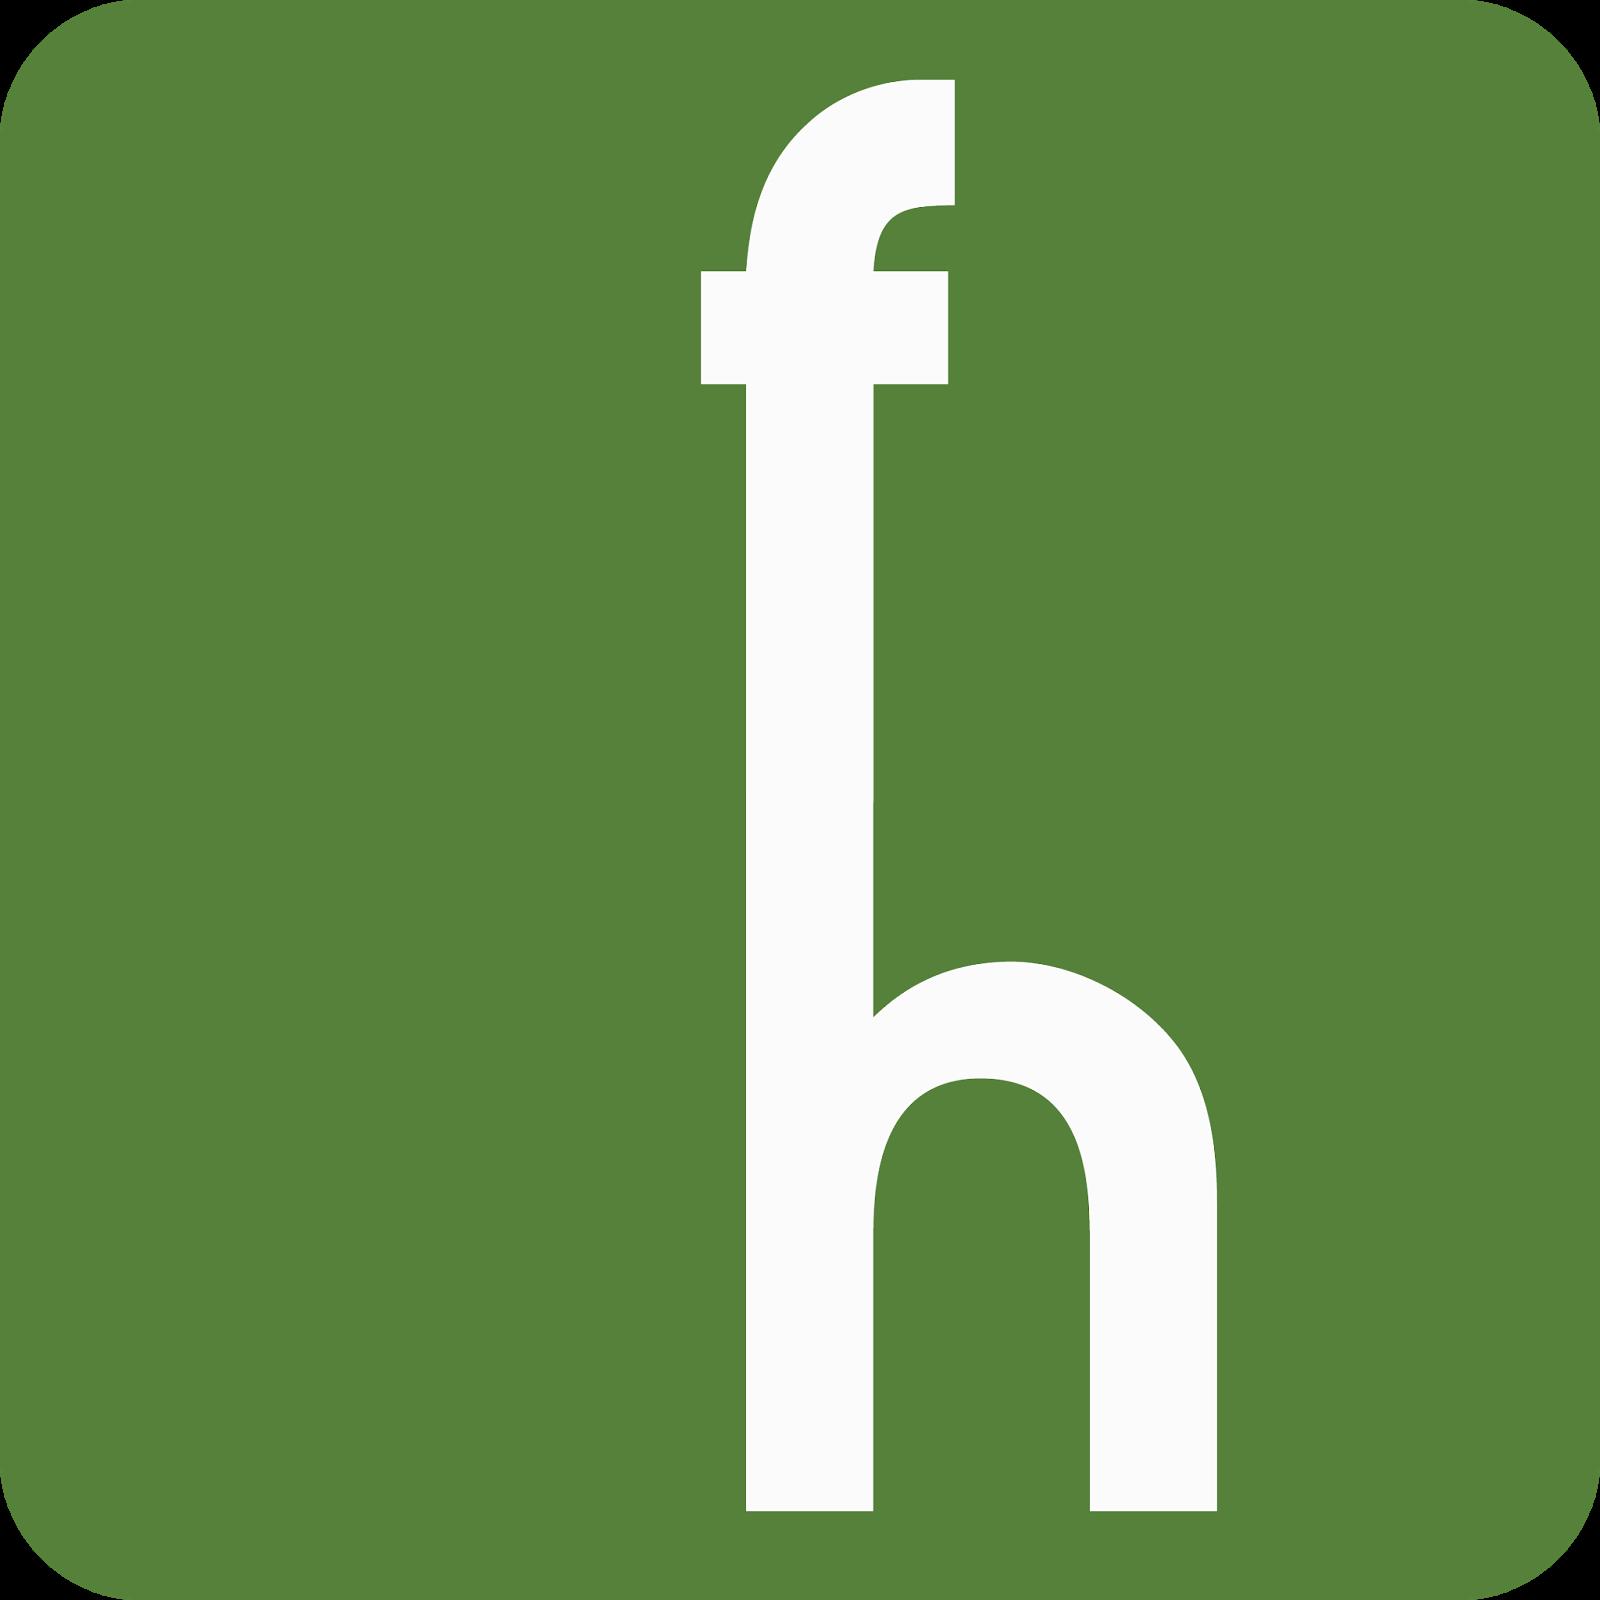 Greeen Logo